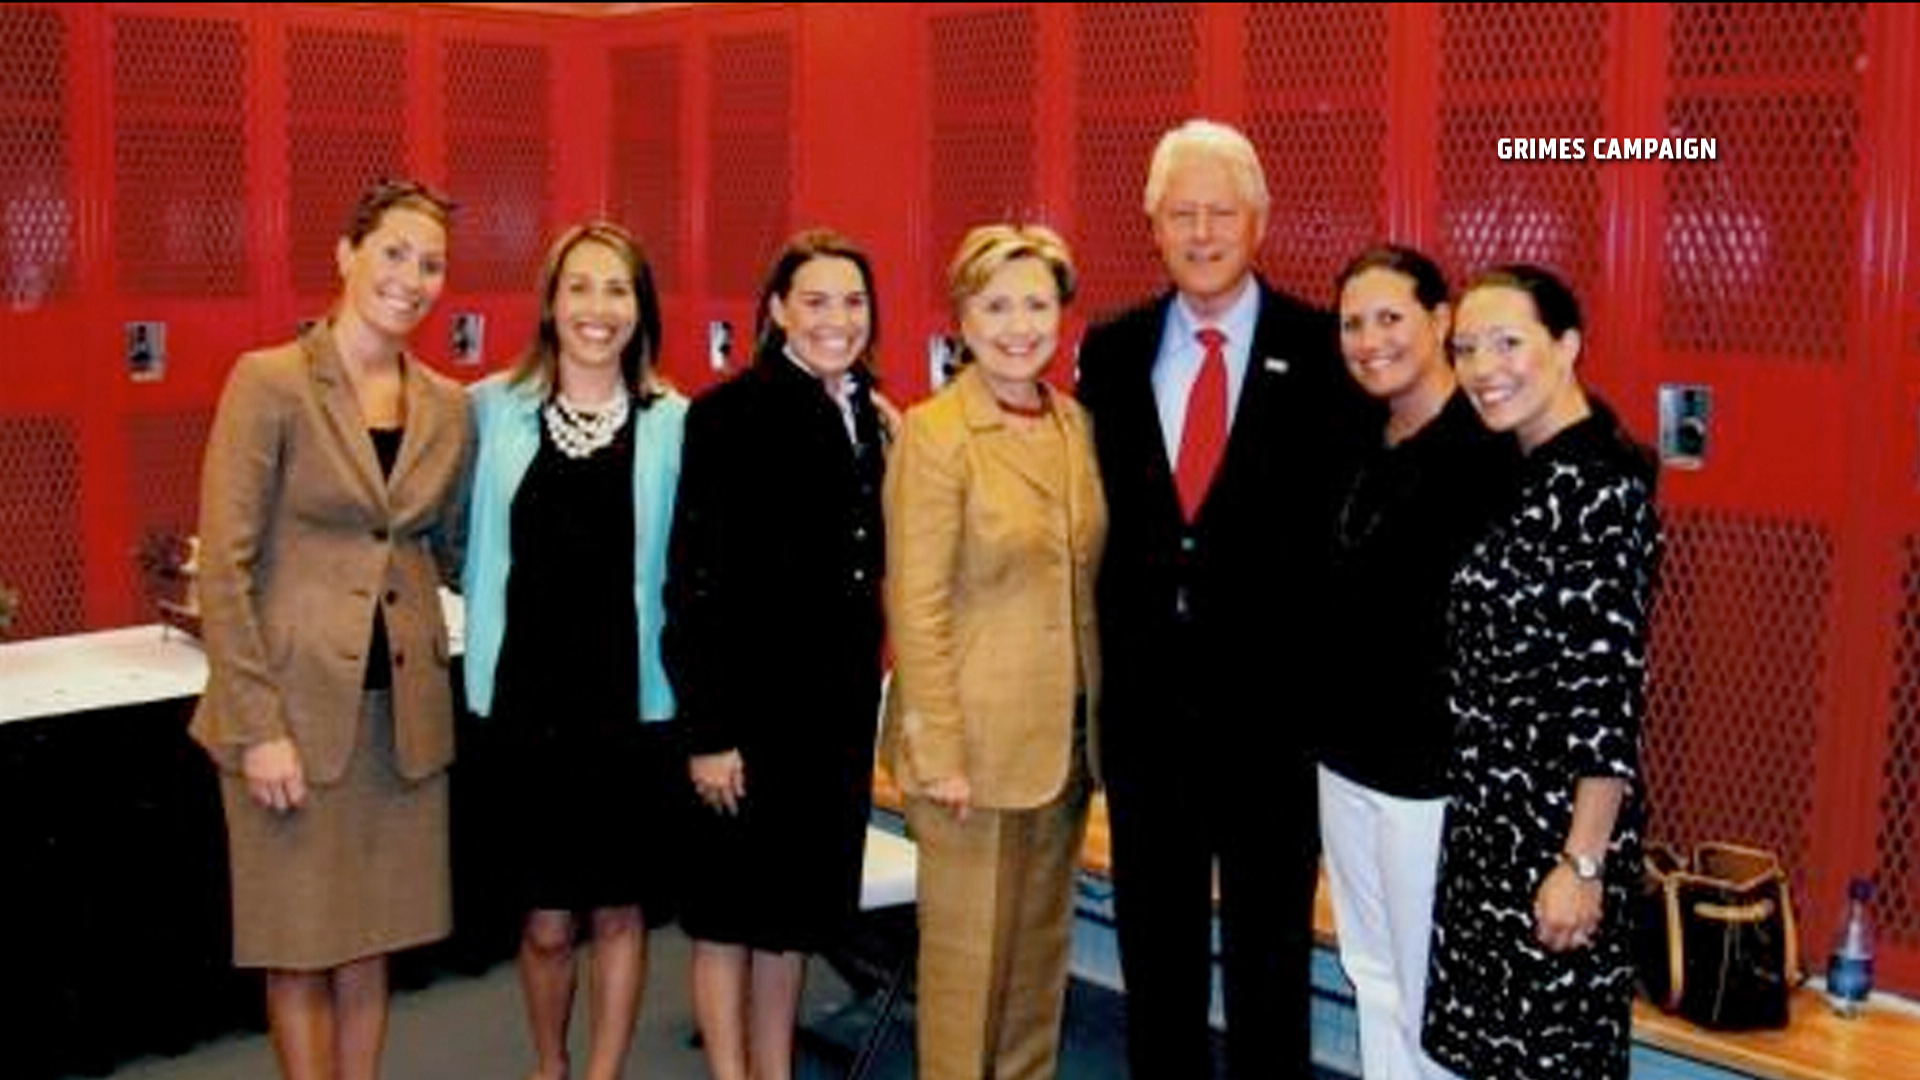 Bill Clinton hits the campaign trail